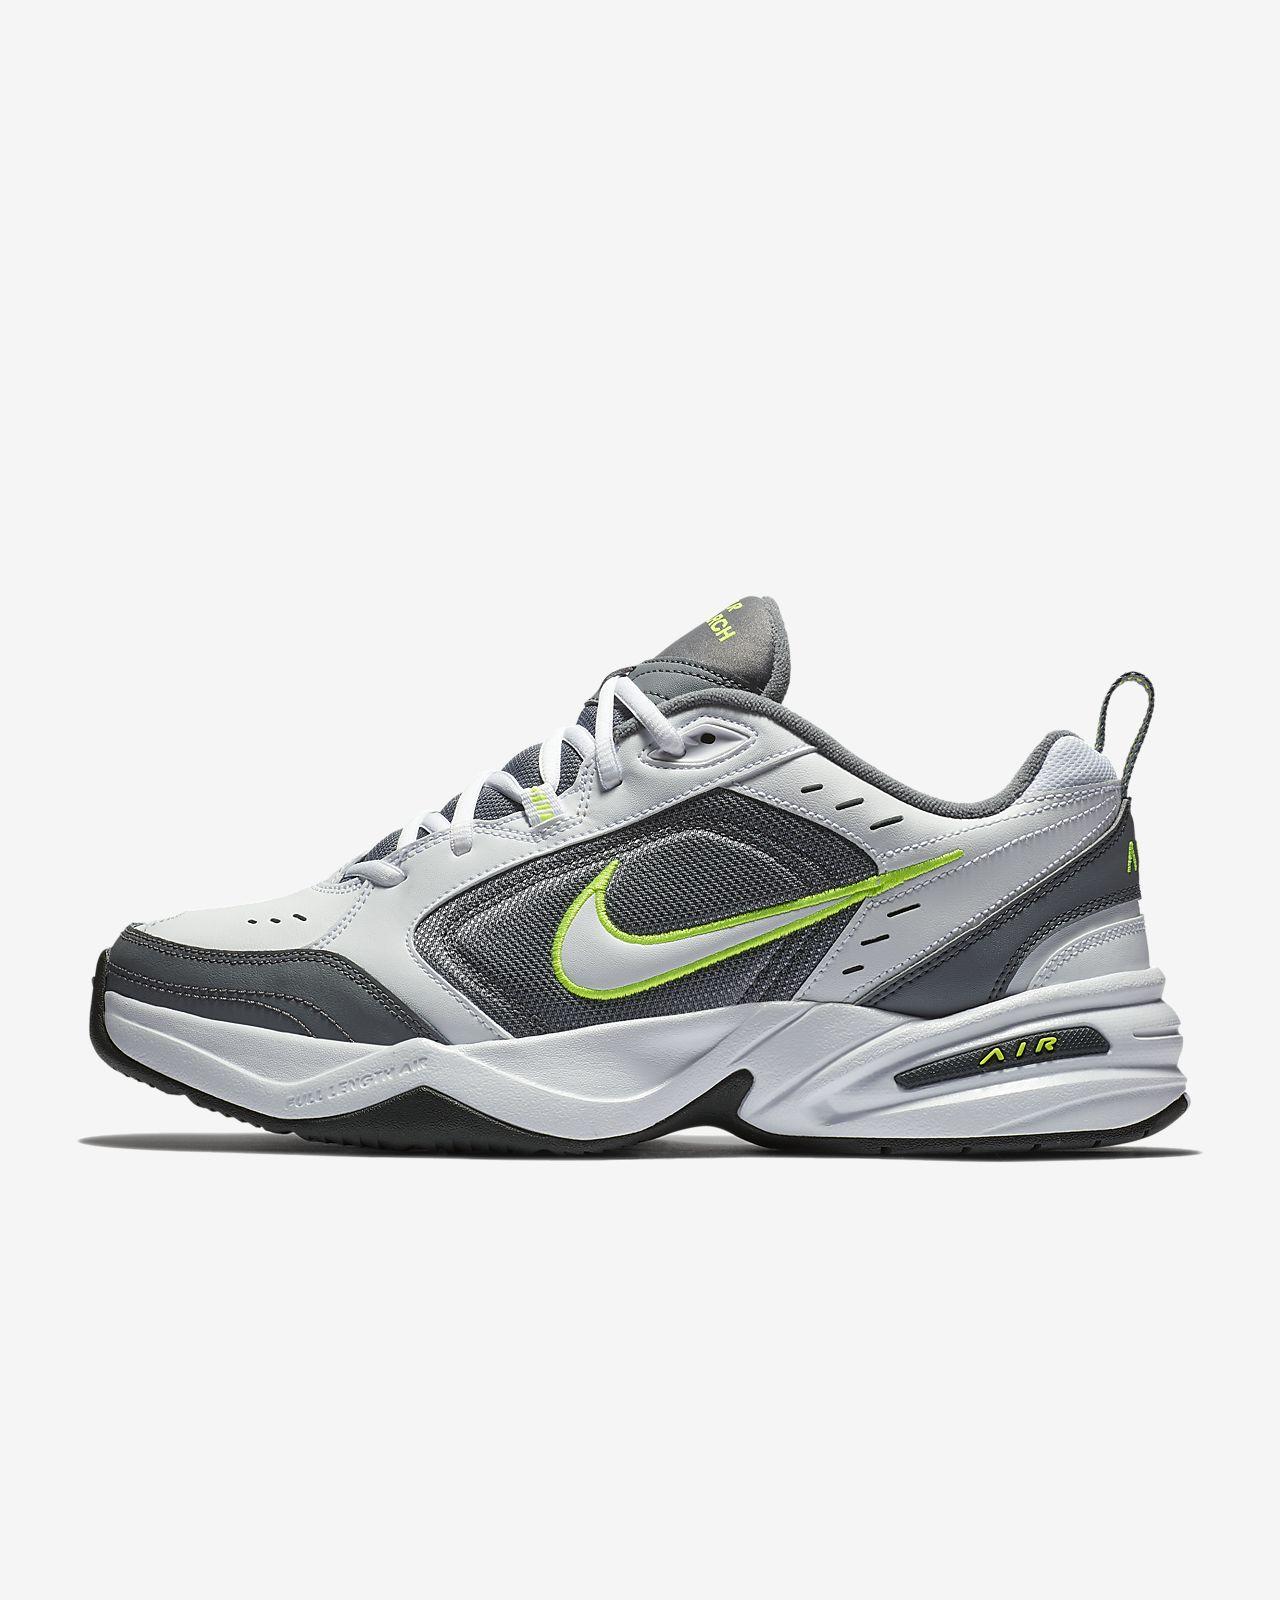 49357d487863 Кроссовки для занятий в зале на каждый день Nike Air Monarch IV ...